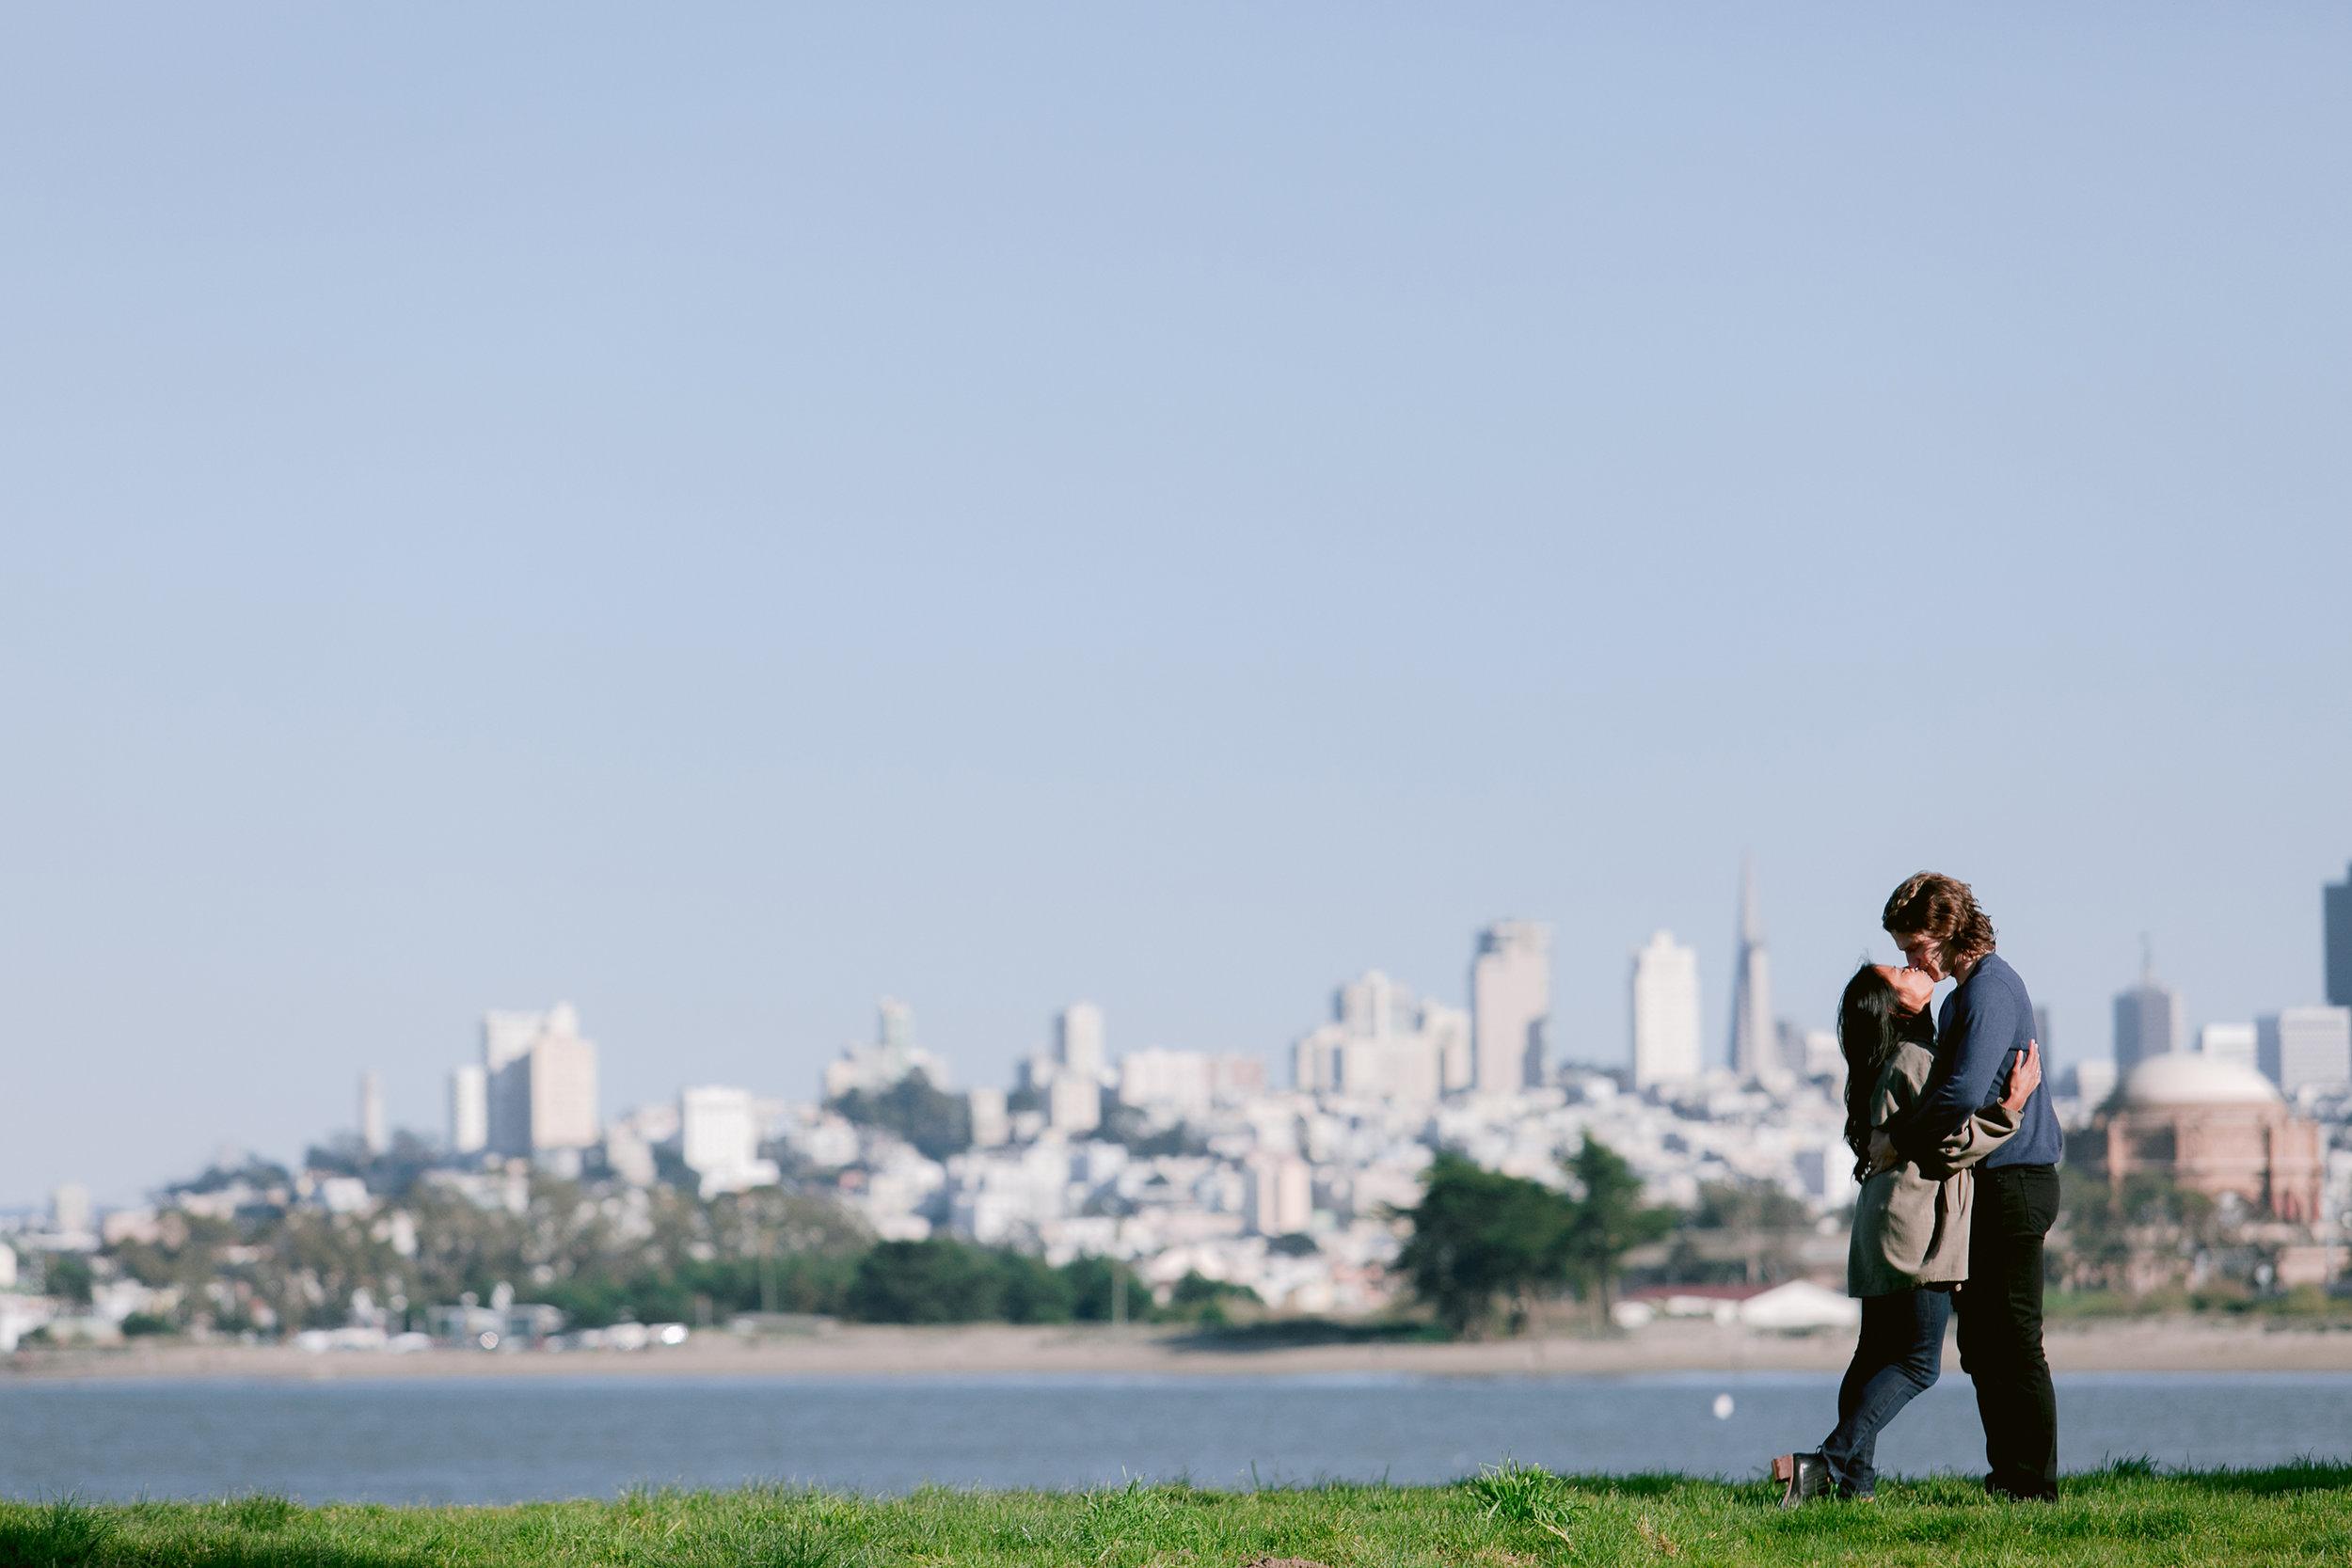 San_Francisco_Engagement_Session_007.jpg